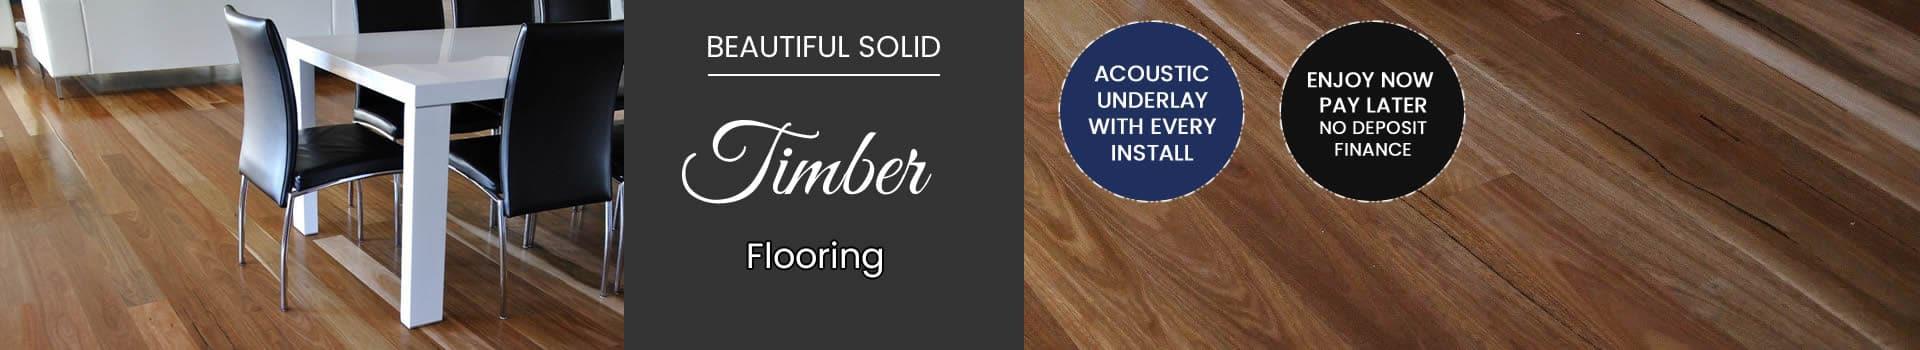 Melbourne solid hardwood floors